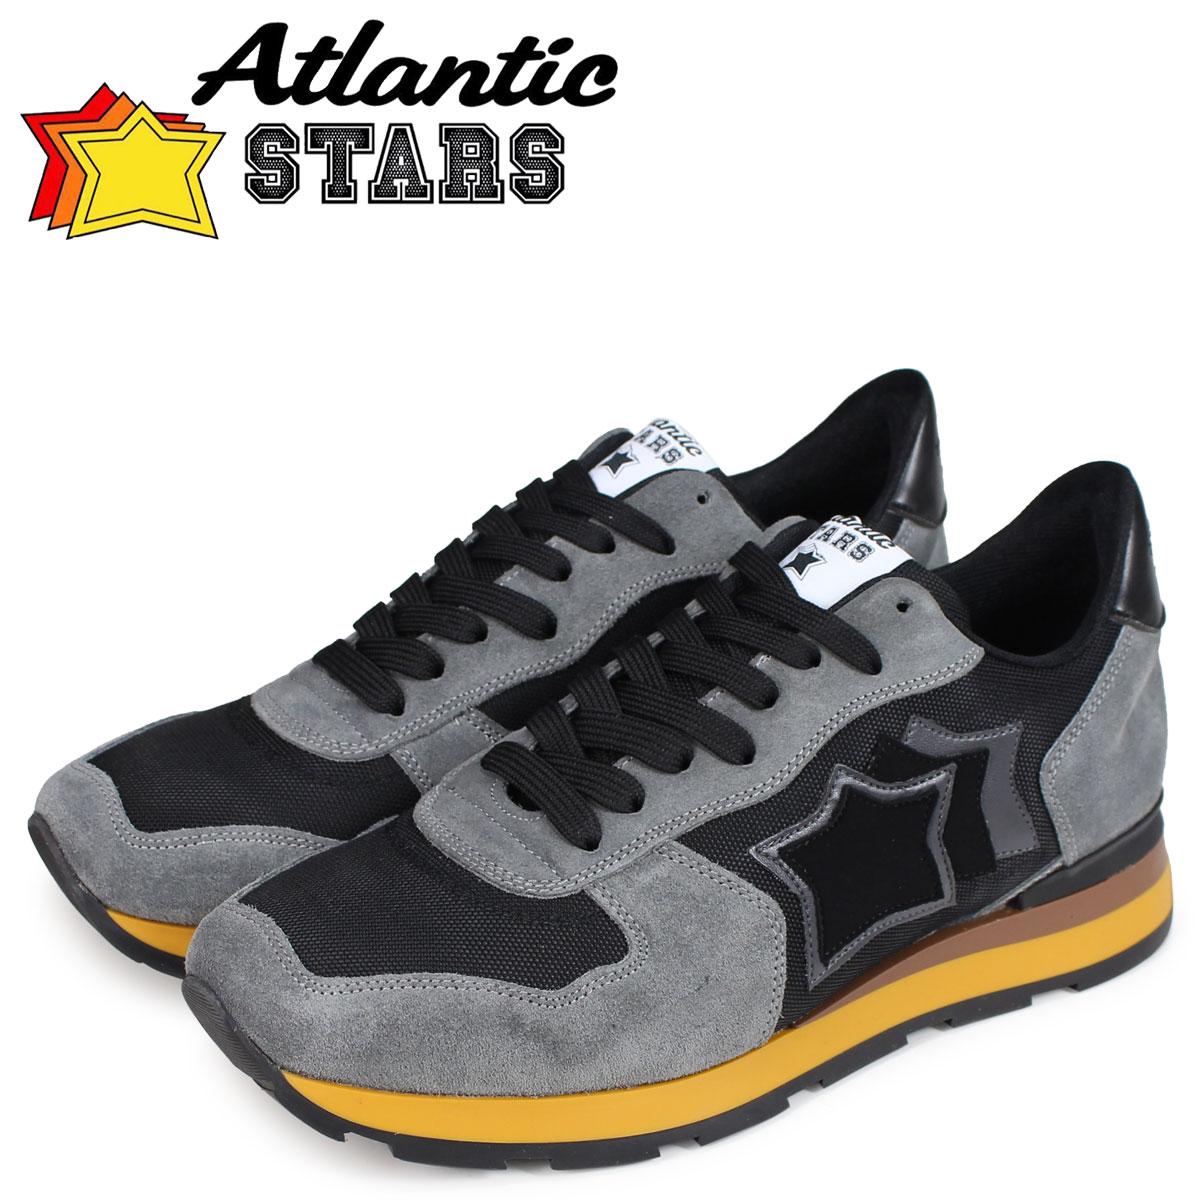 Atlantic STARS メンズ スニーカー アトランティックスターズ アンタレス ANTARES NPN-03N ブラック 黒